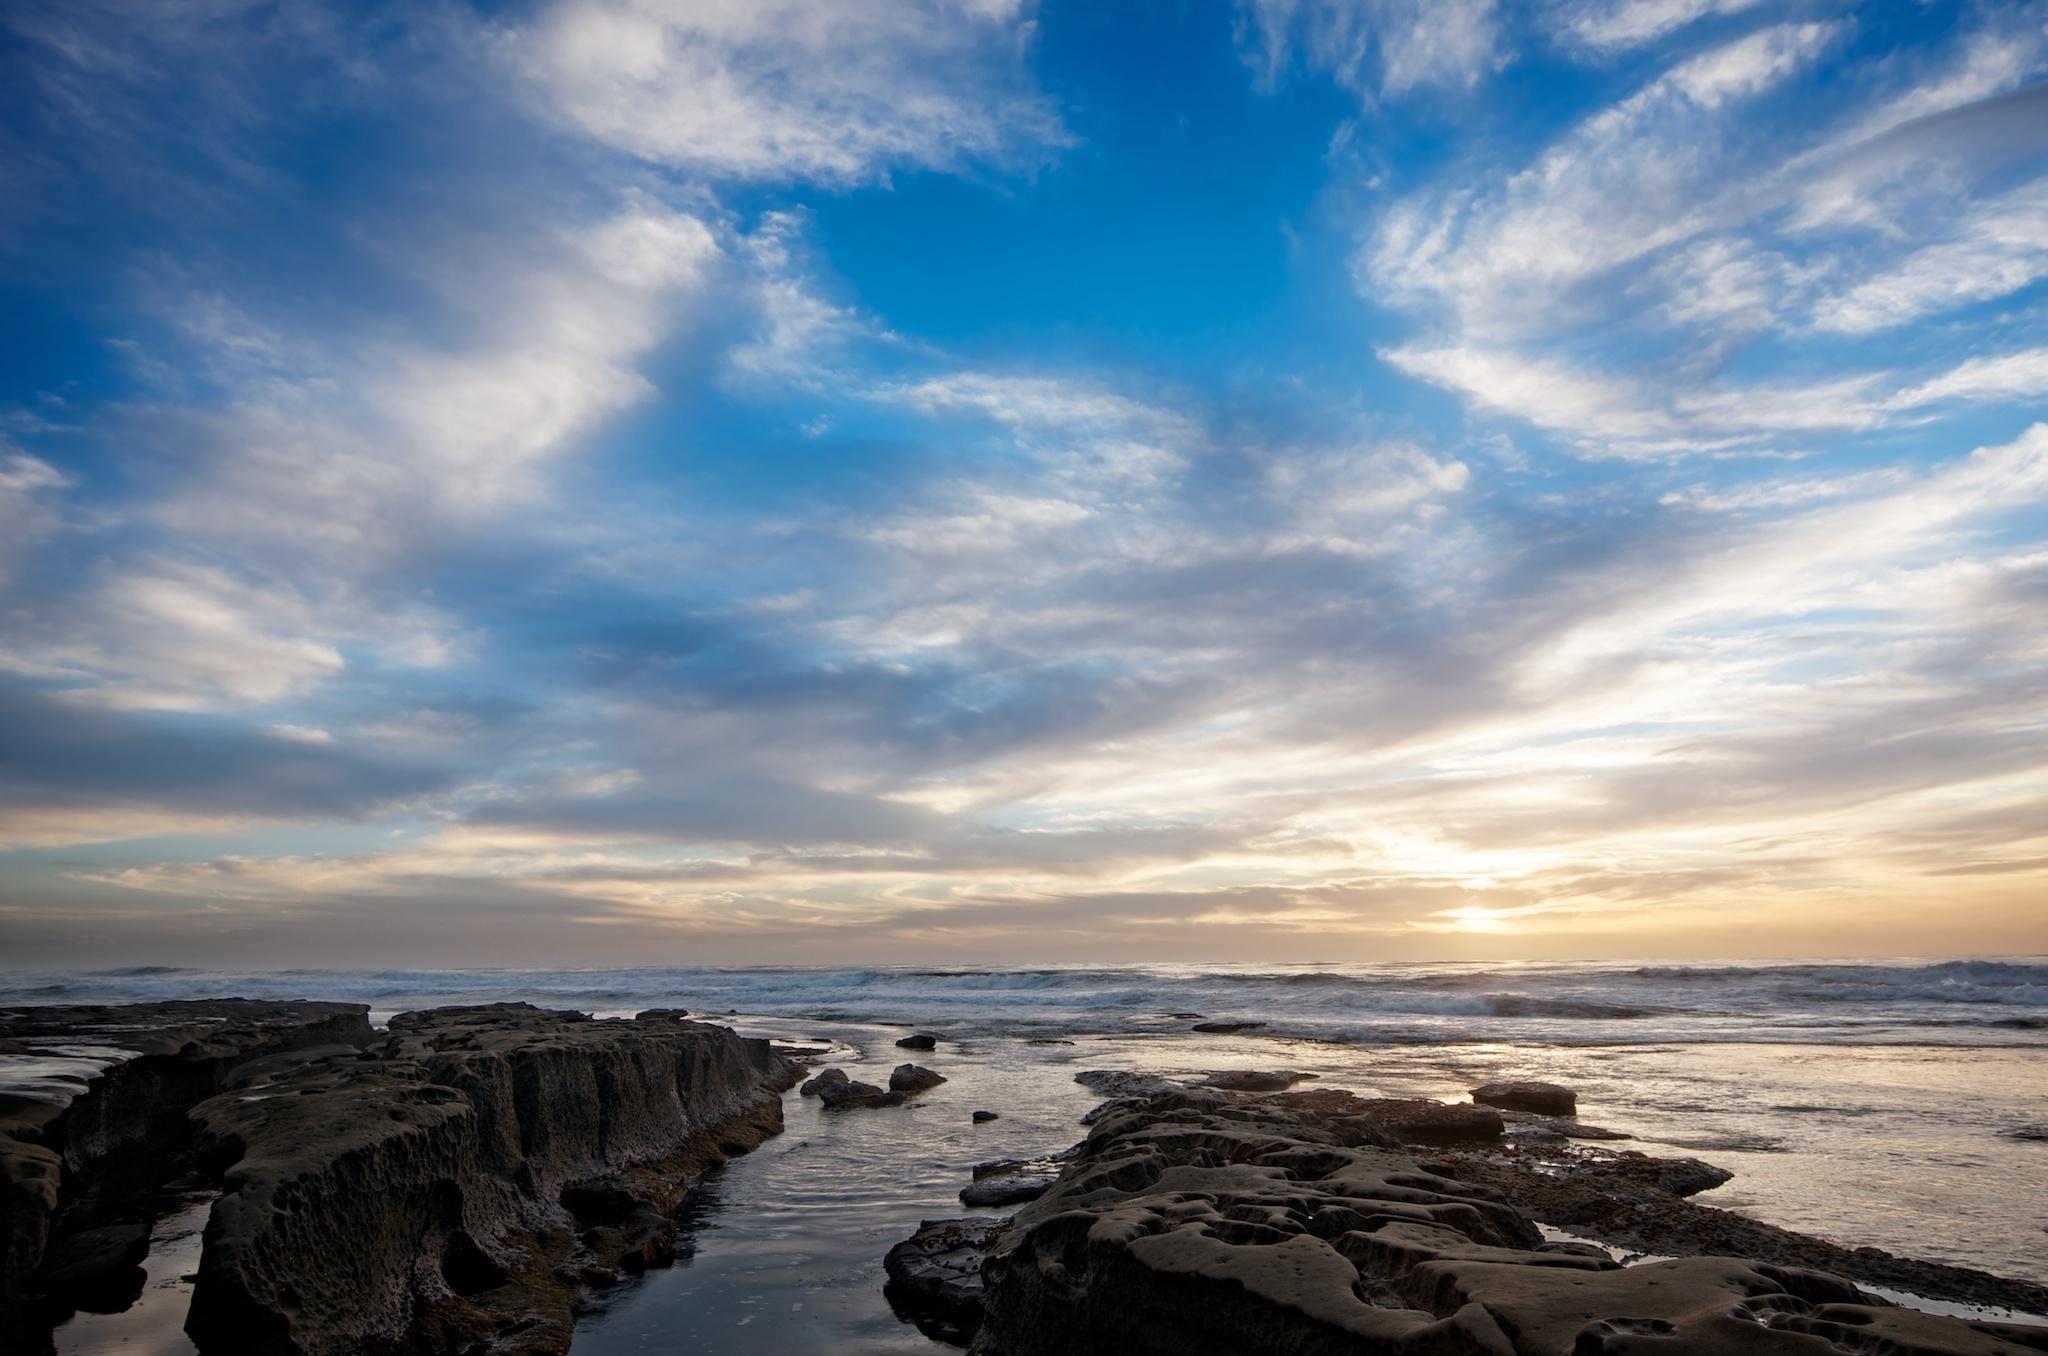 La-Jolla-Sunset-Rocks.jpg